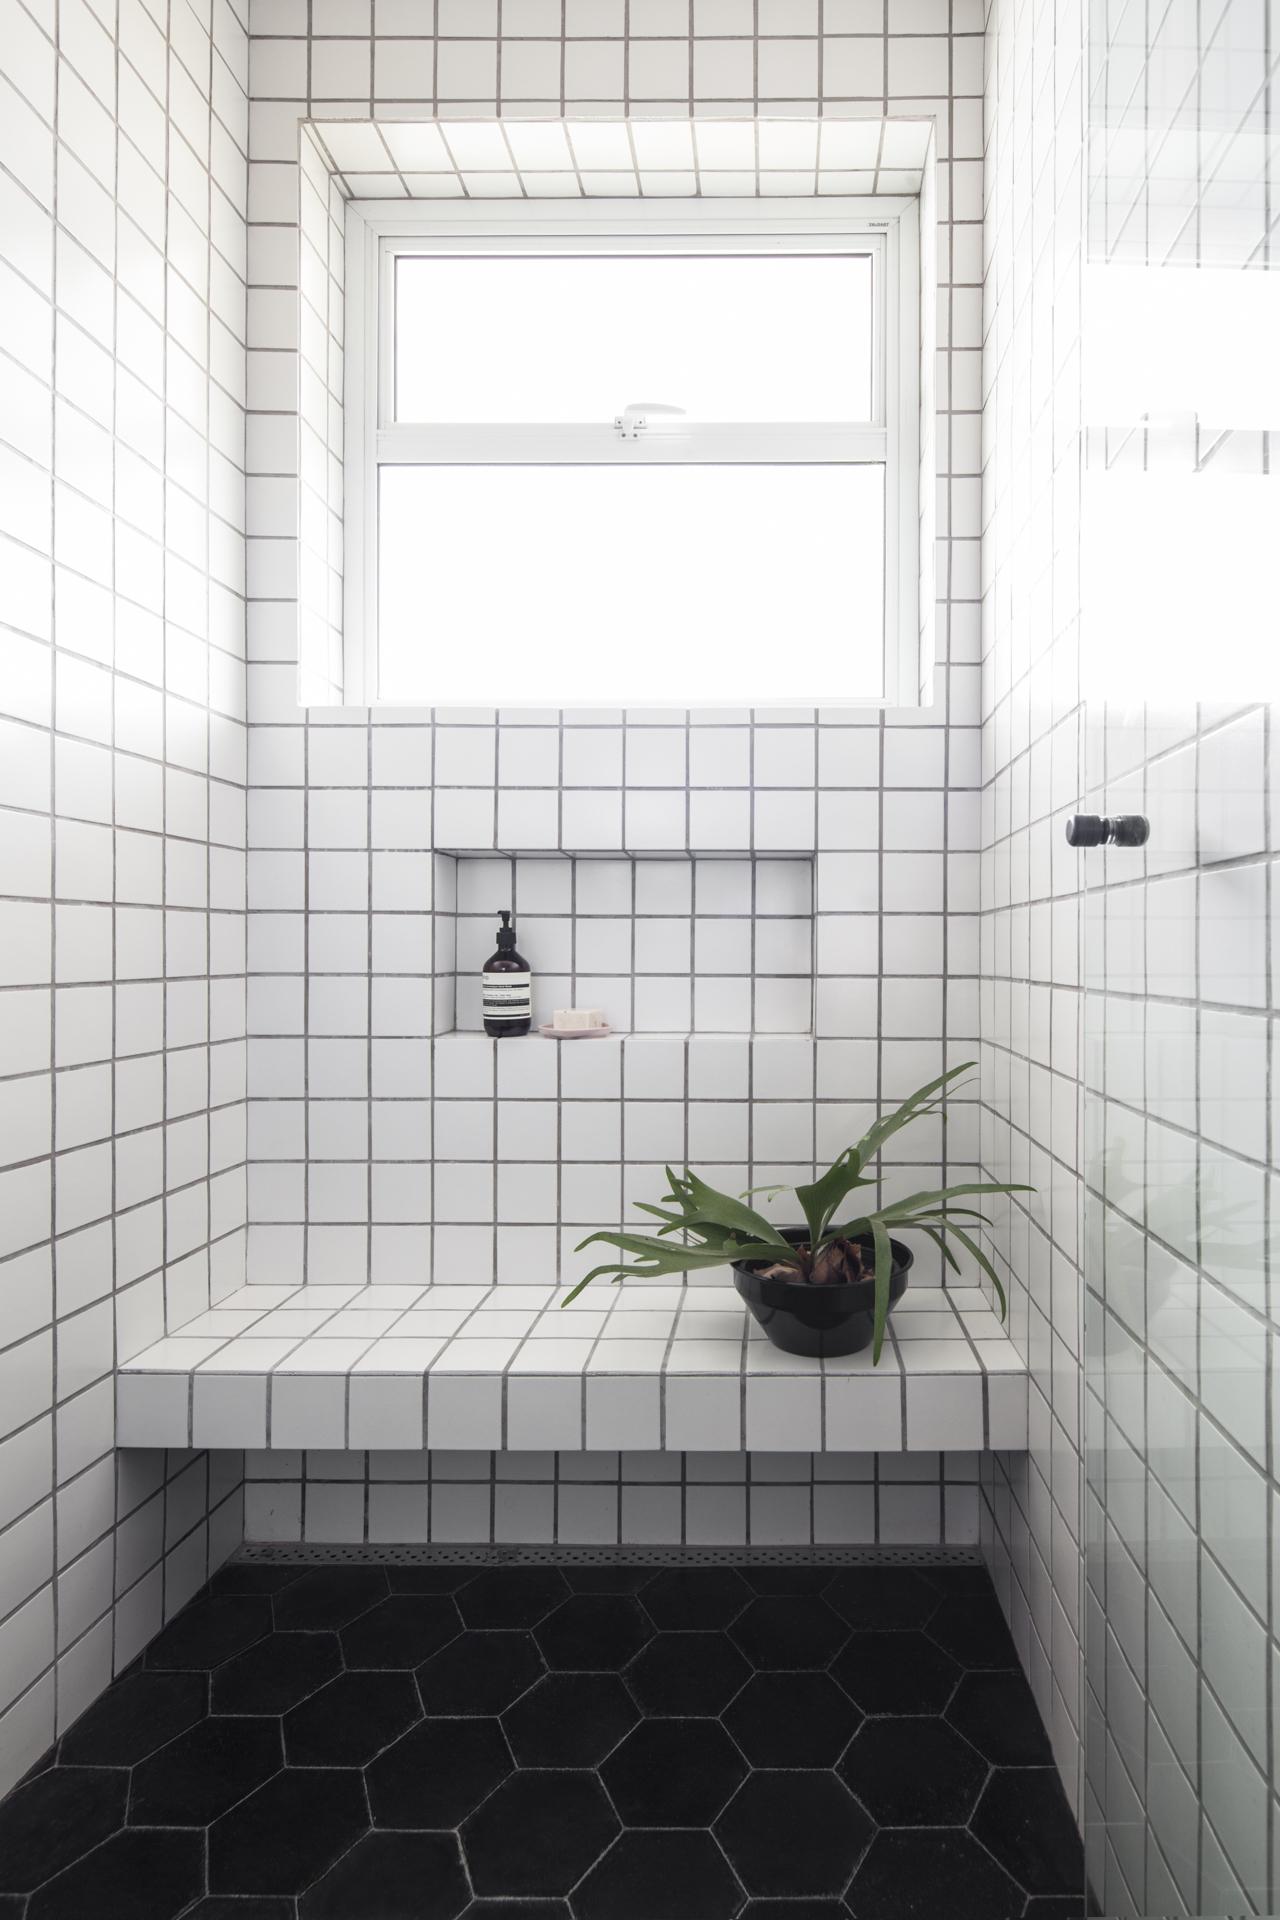 banhos rb - estudio nodo-2.jpg